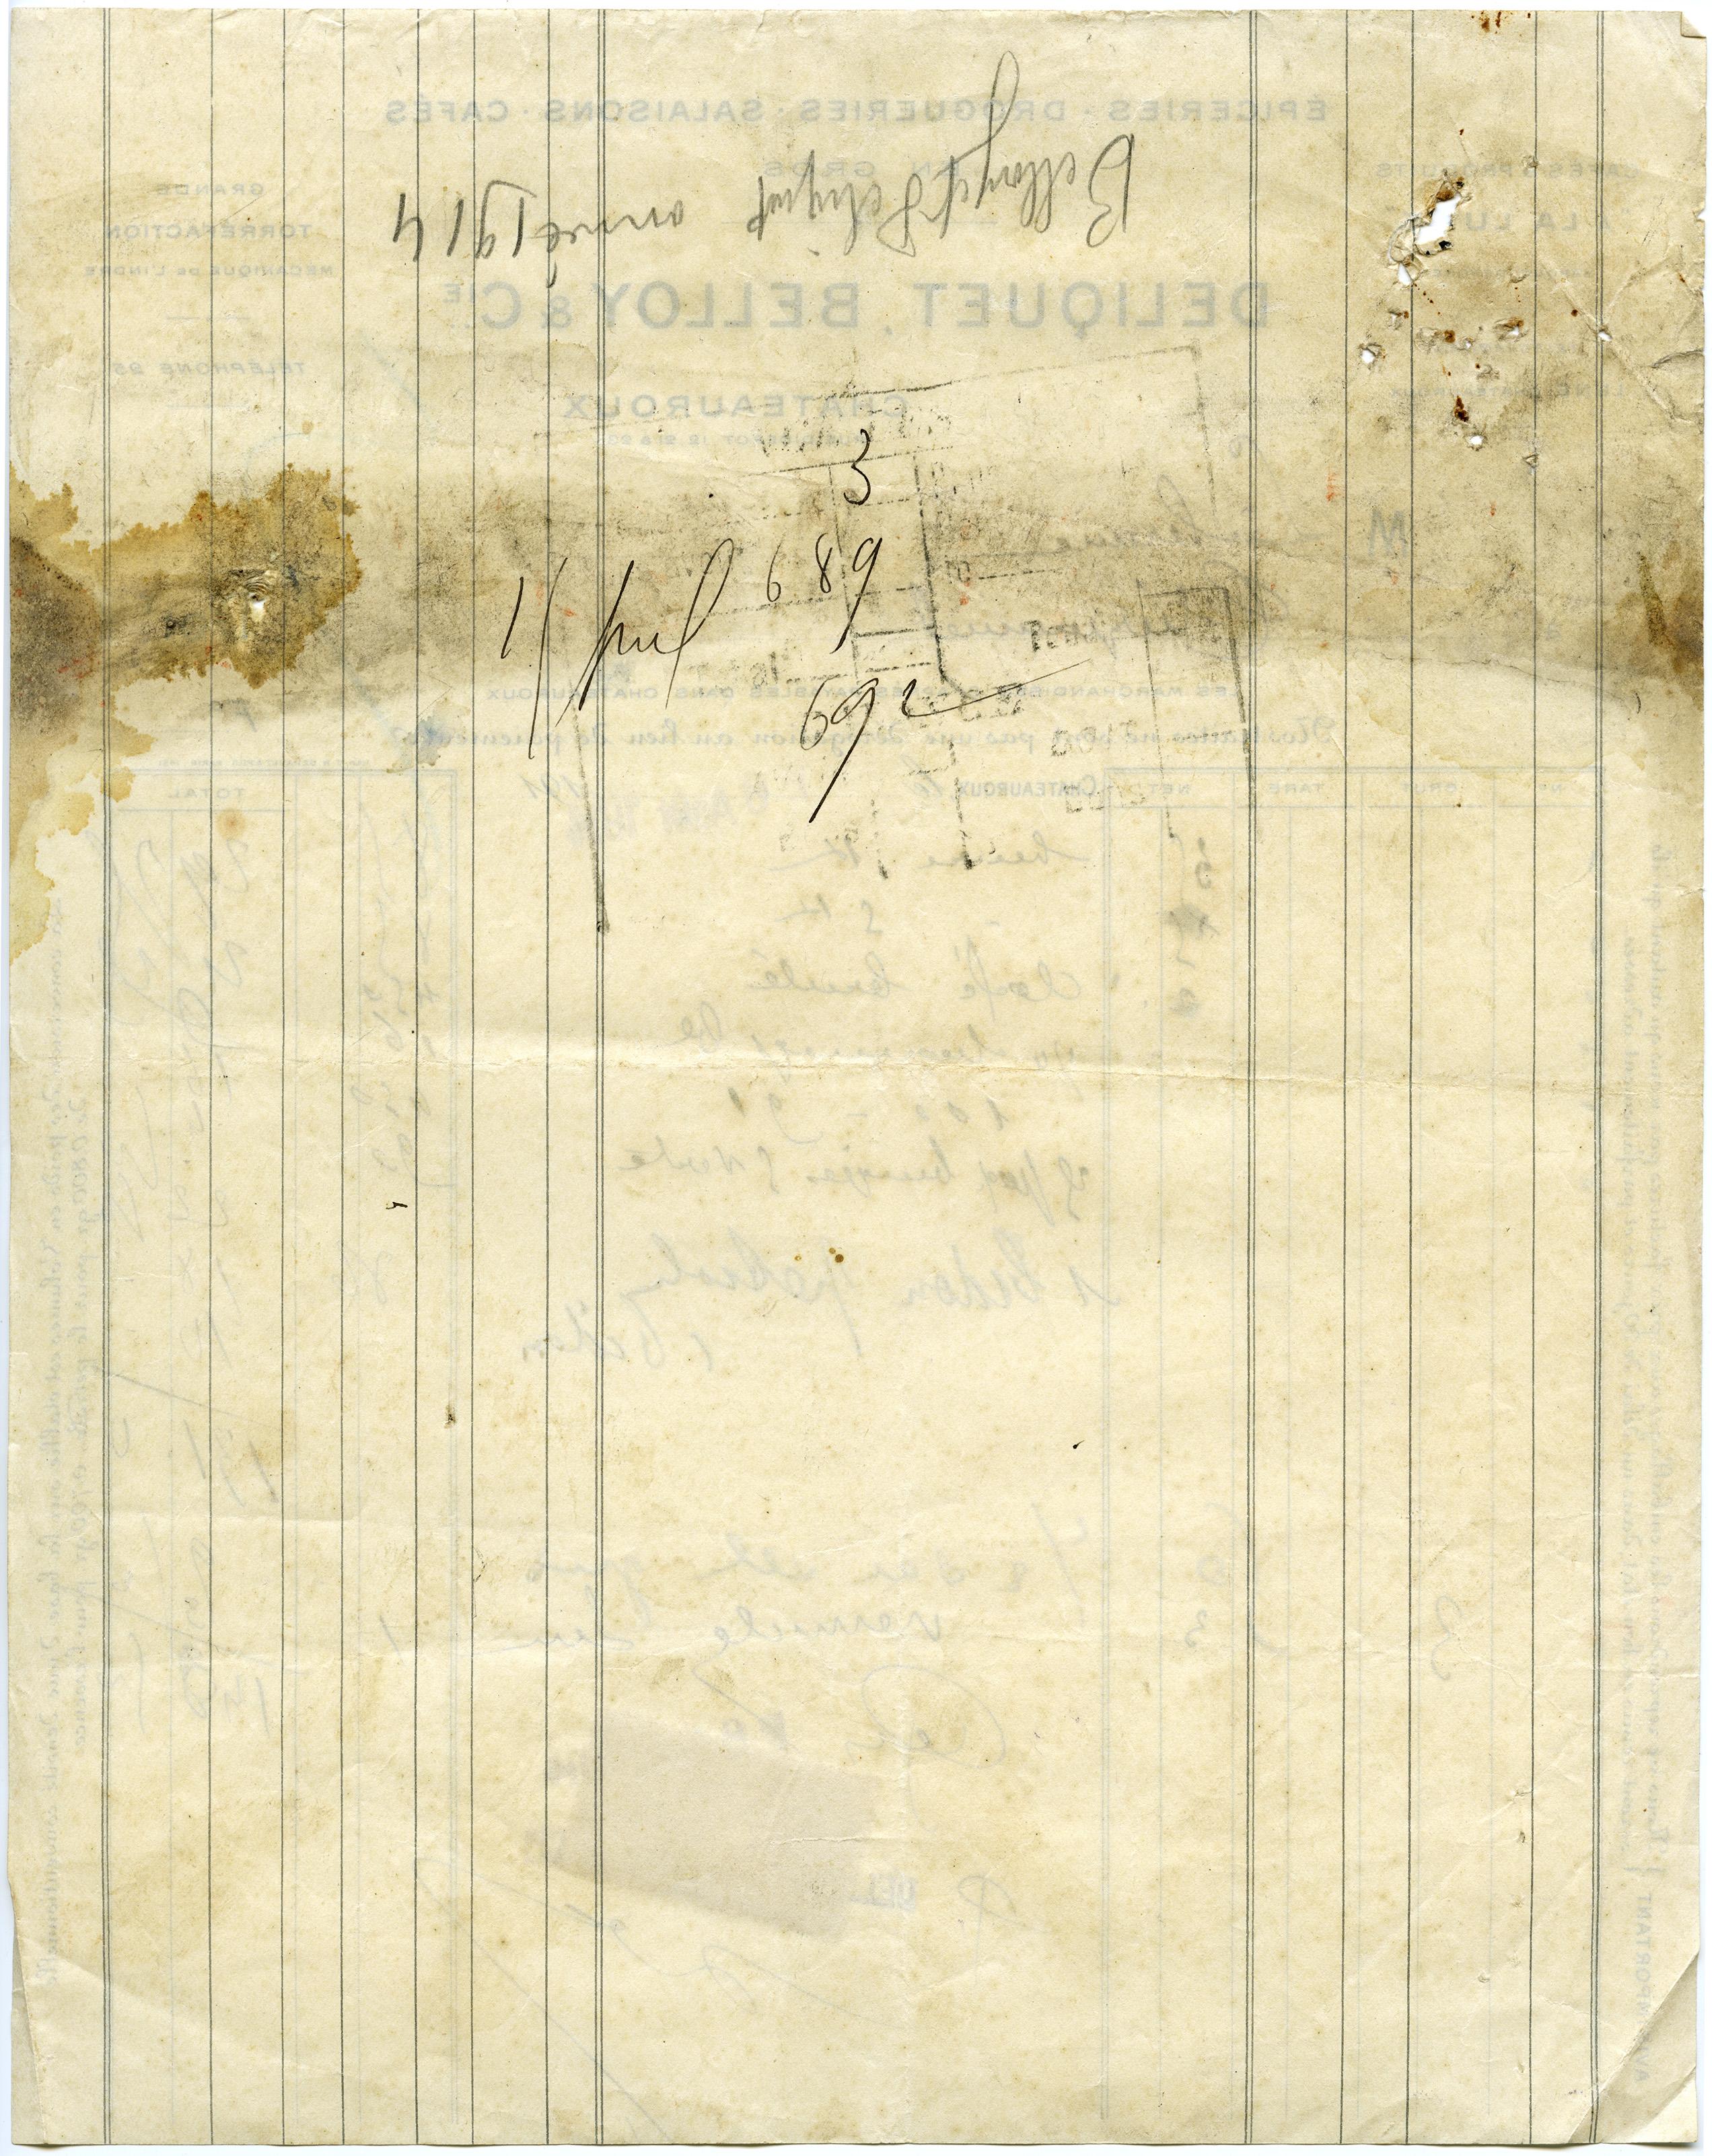 free vintage image, grunge page, aged ephemera, old paper, shabby and worn